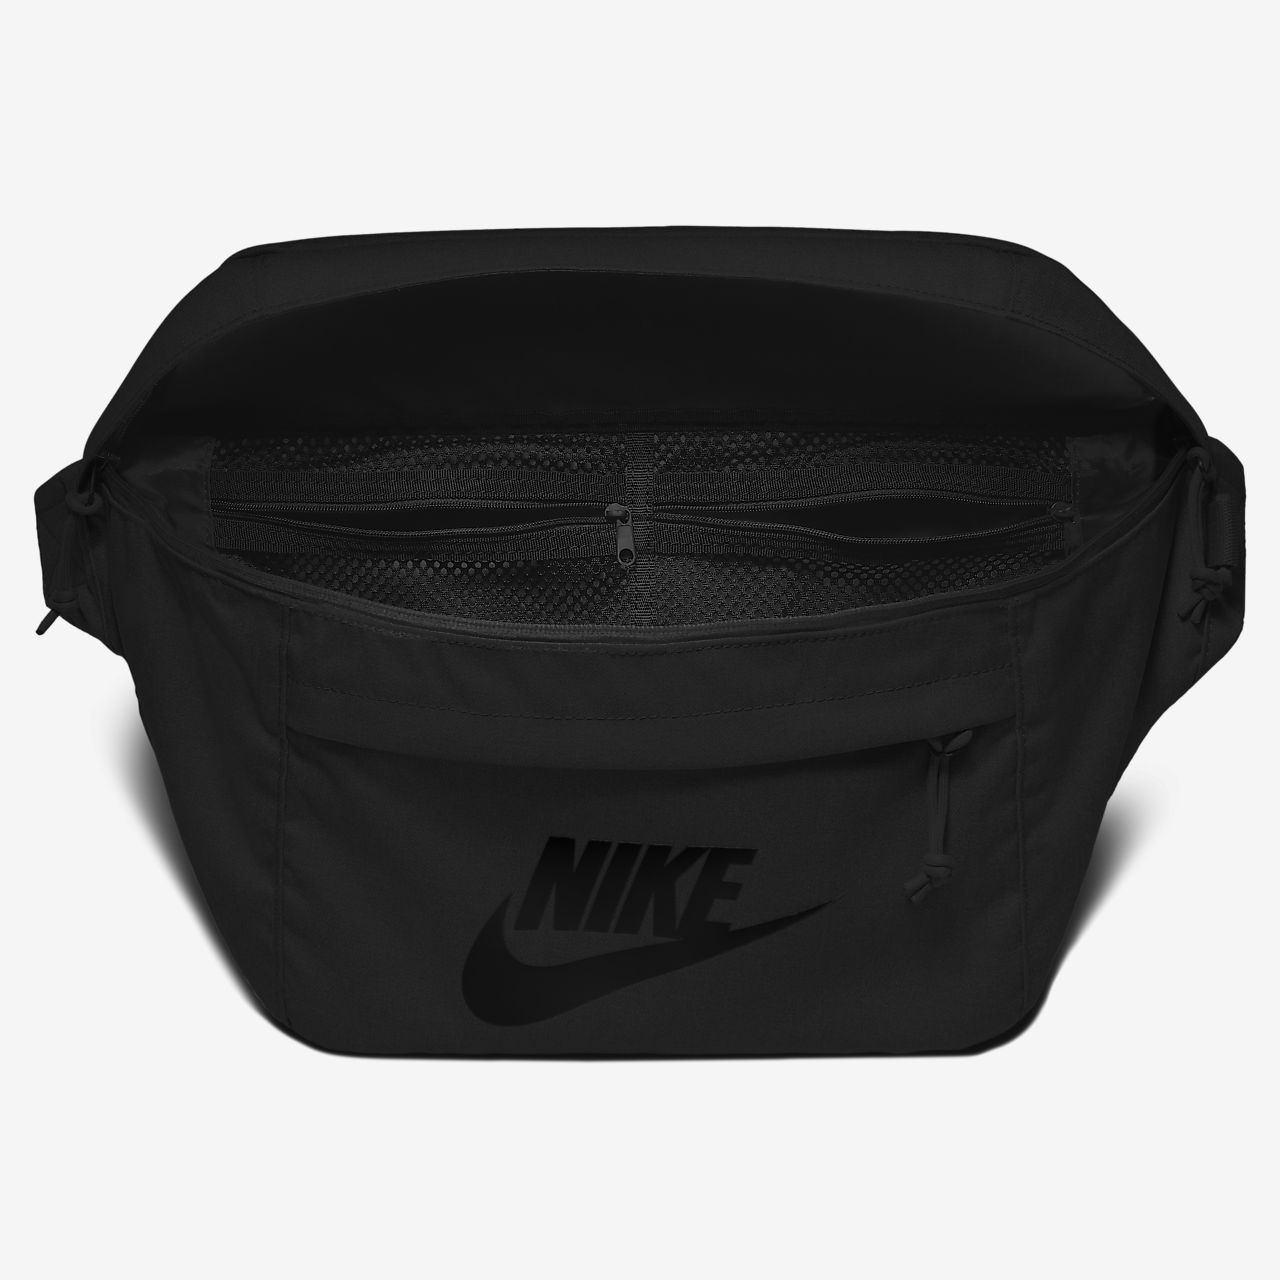 Nike Air Hip Bag Sac Banane Noir Taille Unique Black//Black